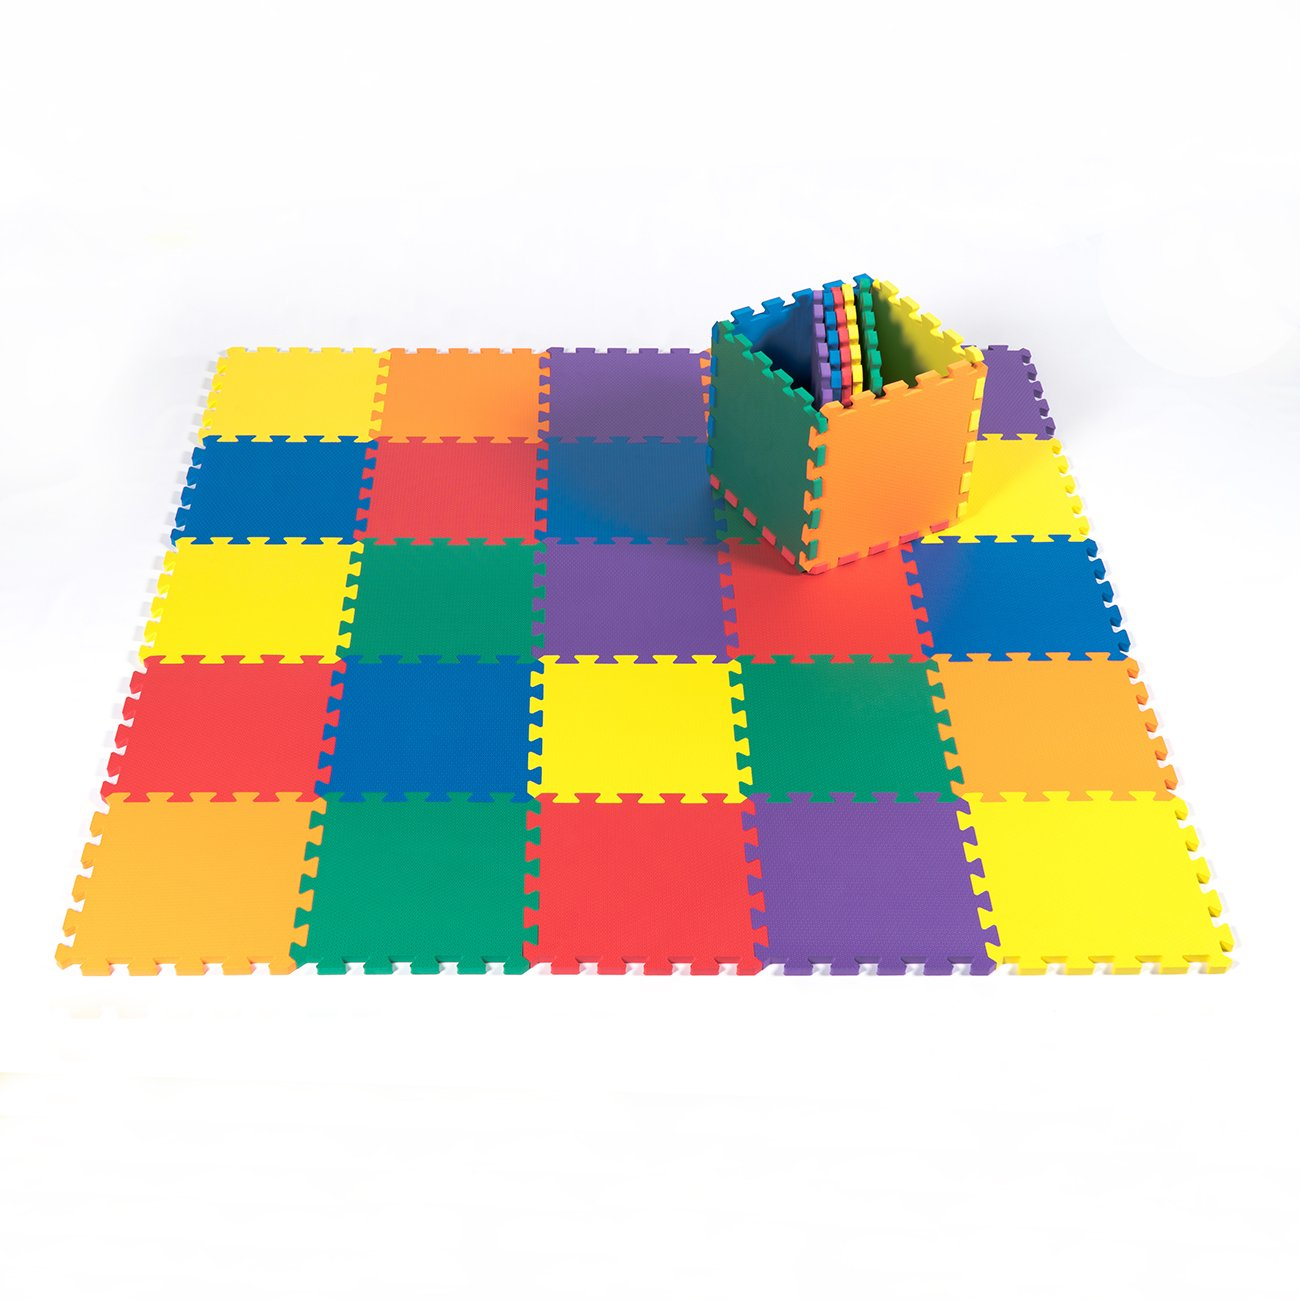 Kidzone 12''x12'' 36 Piece Kids Baby Play Mat Foam Puzzle Play Mat EVA Non-Toxic, 6 Colors 1/2'' Thick